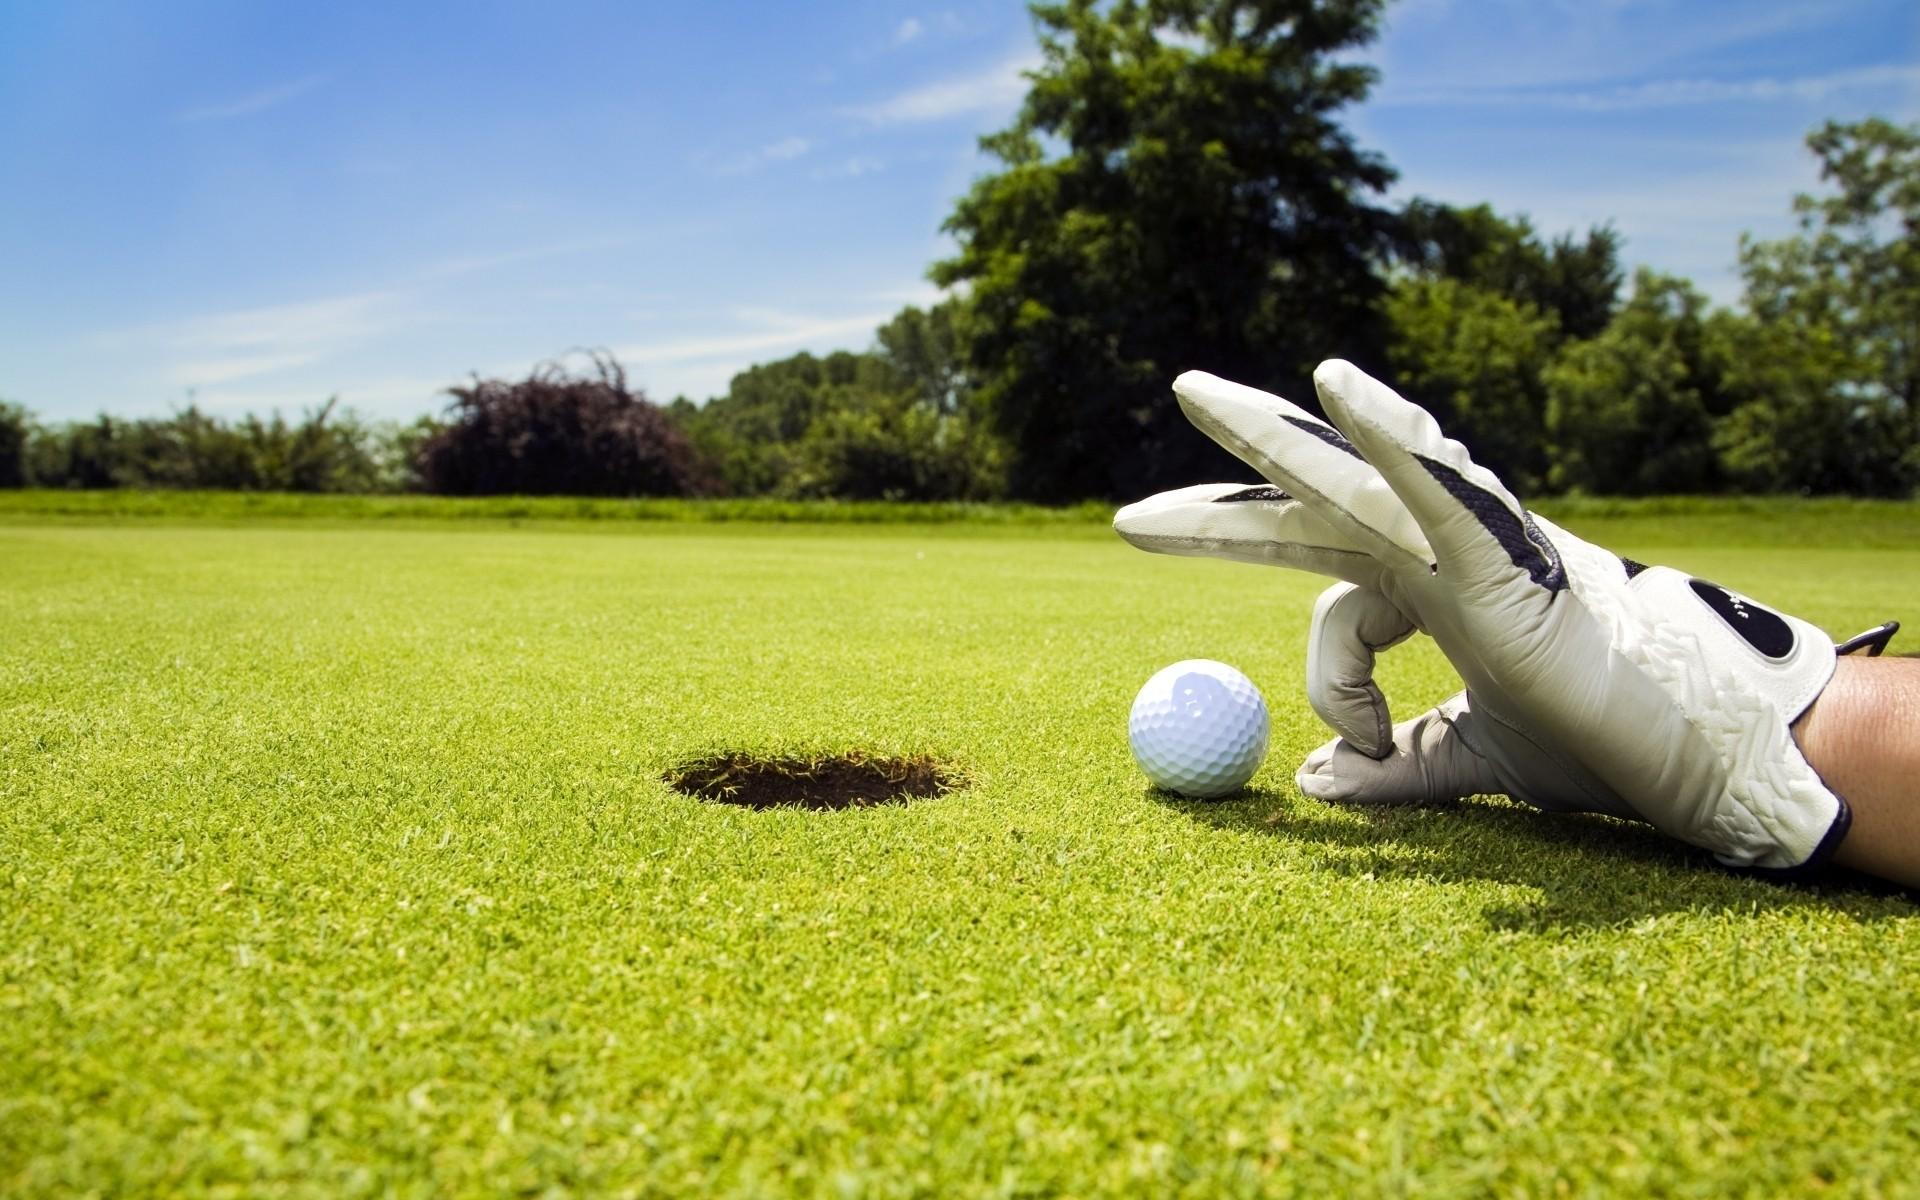 the green golf ground pix